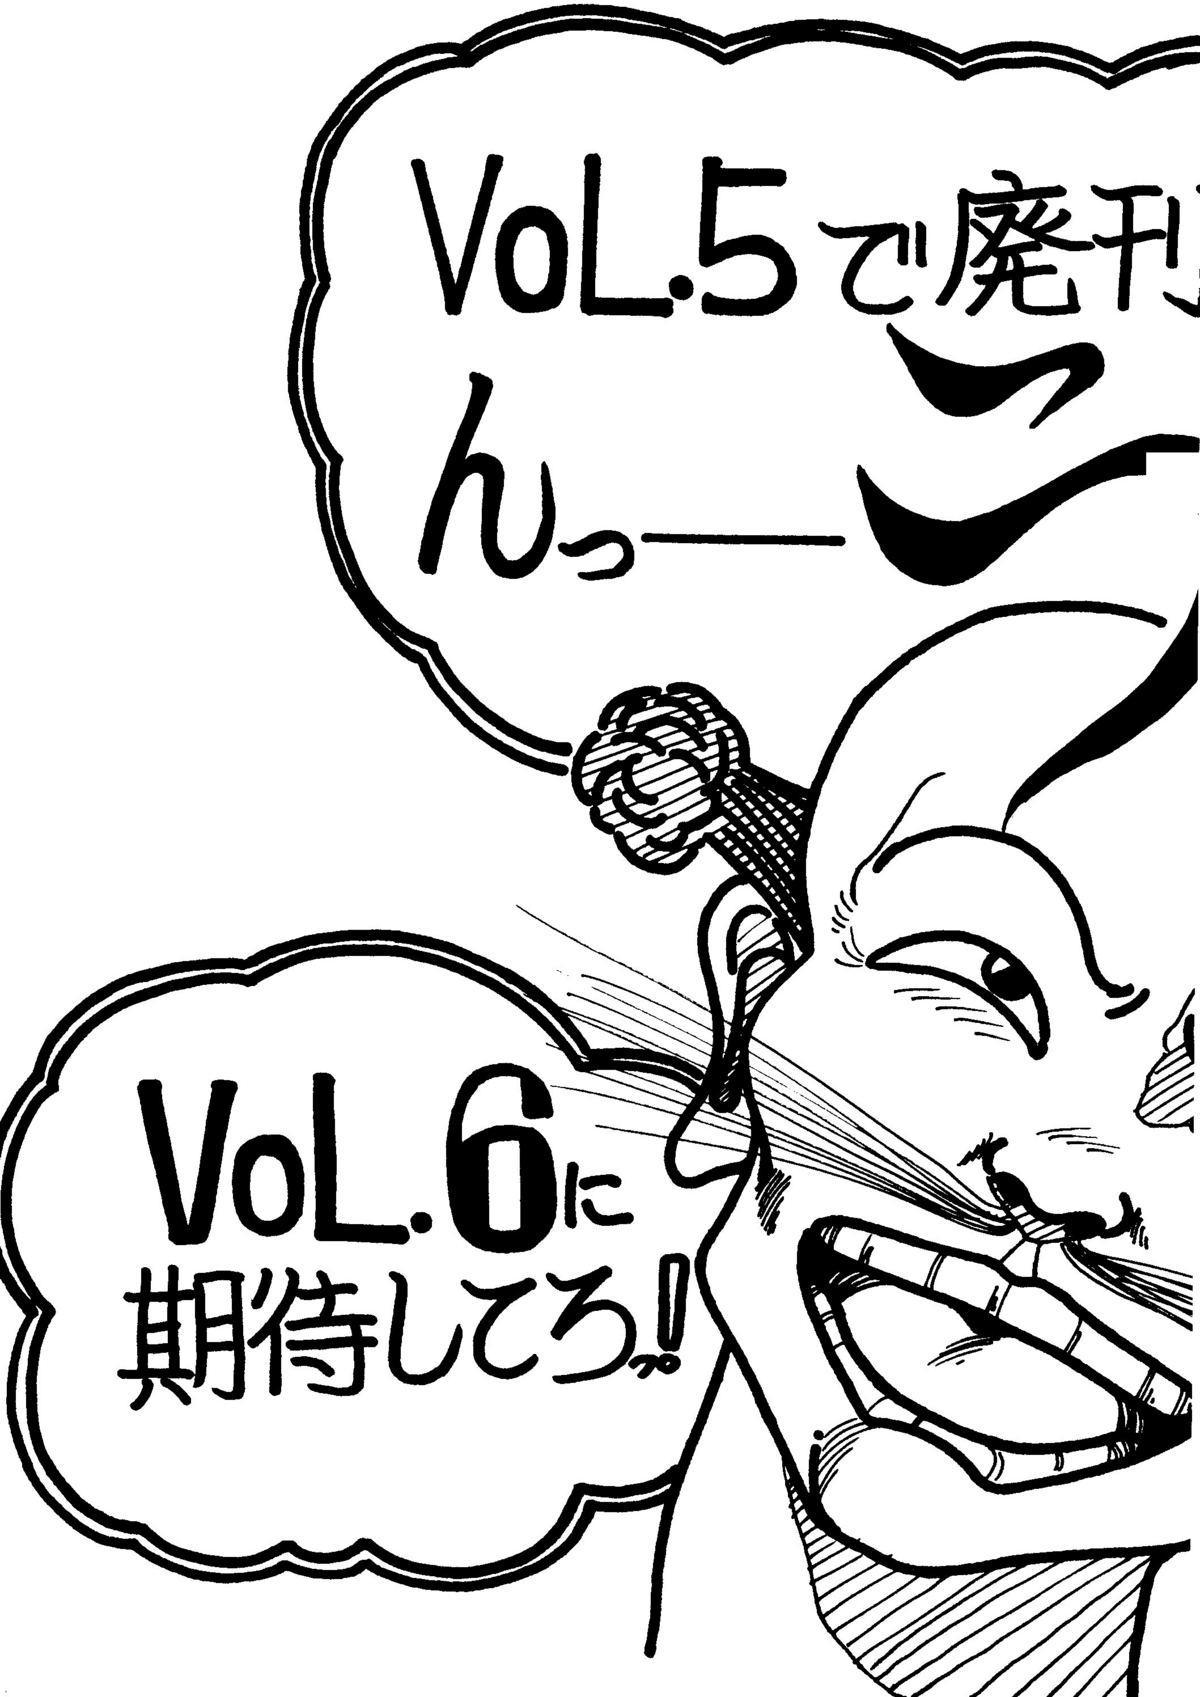 Tororoimo Vol. 5 2